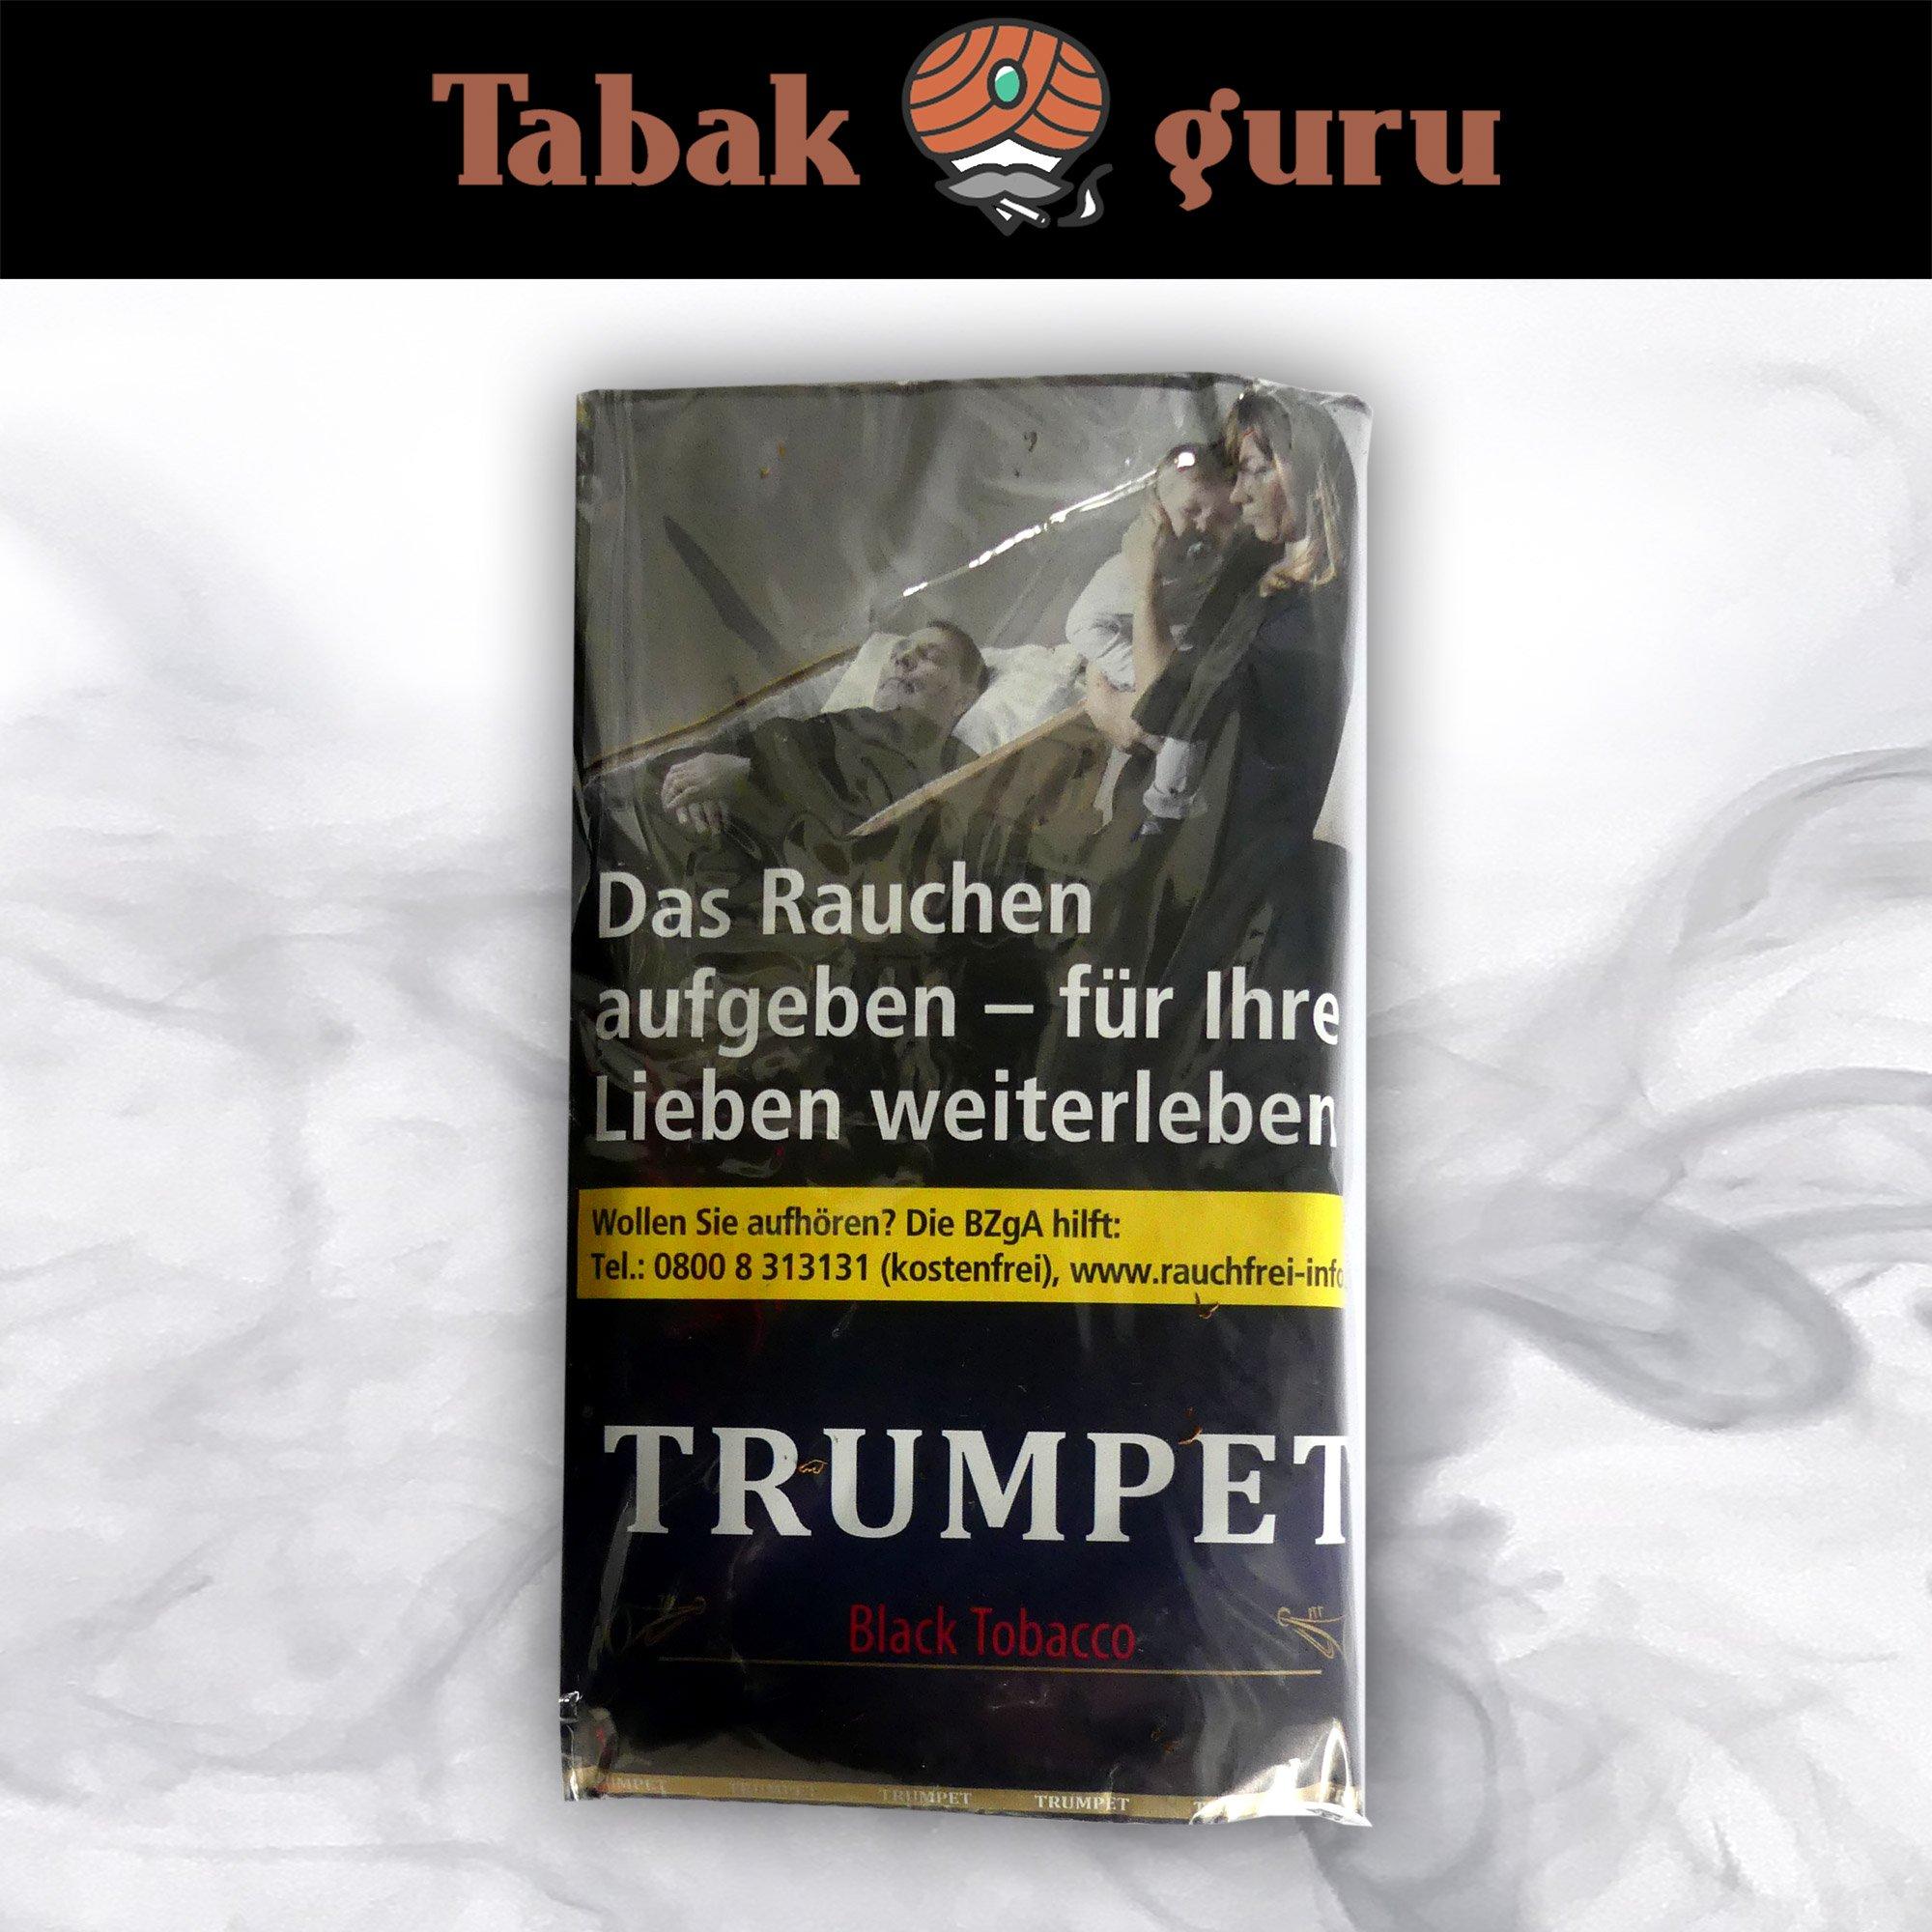 Trumpet Black Tobacco Drehtabak 38 g